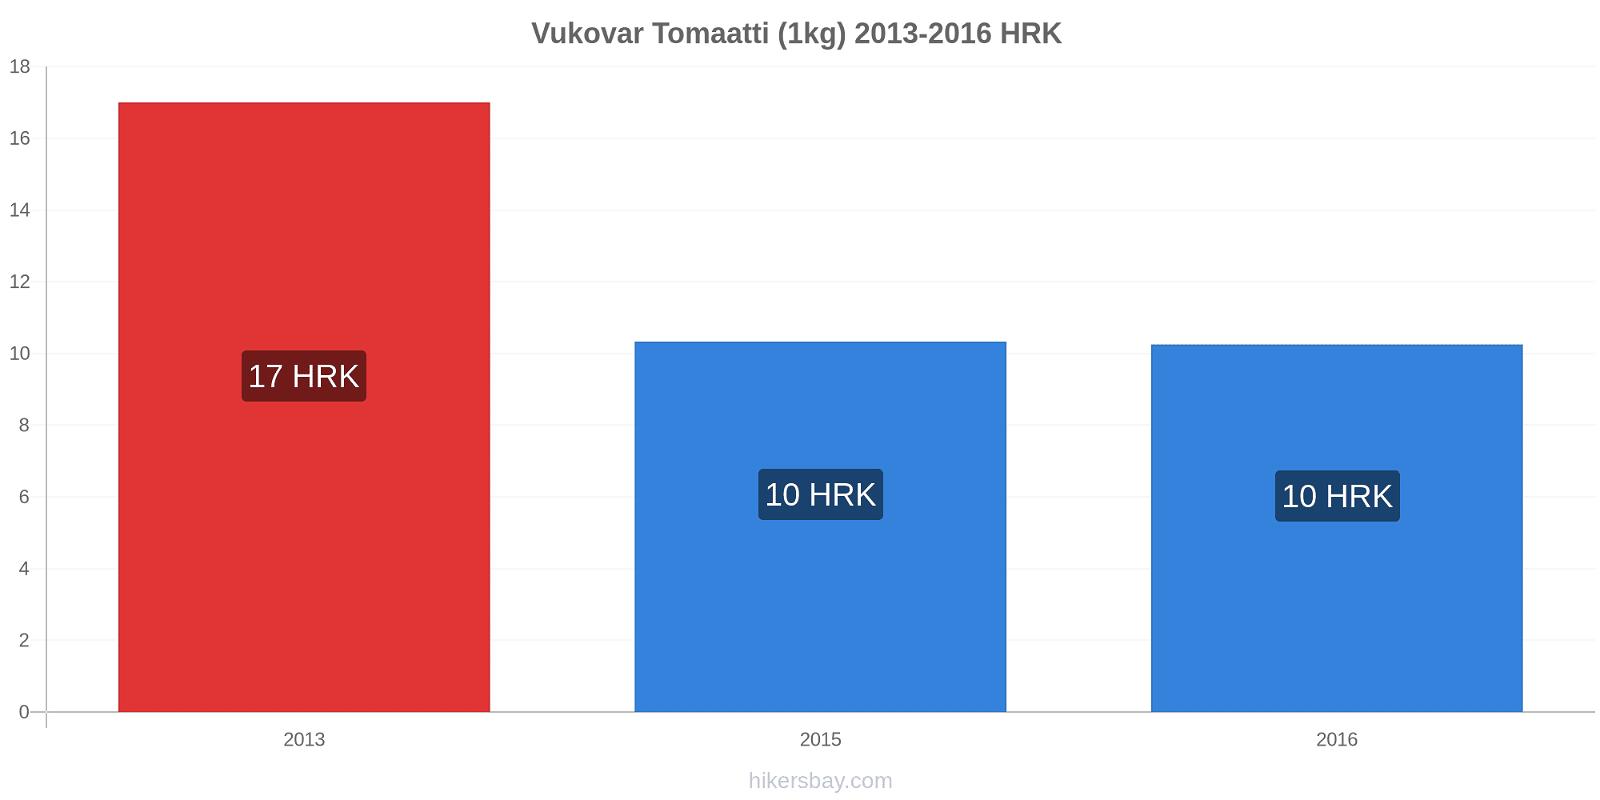 Vukovar hintojen muutokset Tomaatti (1kg) hikersbay.com